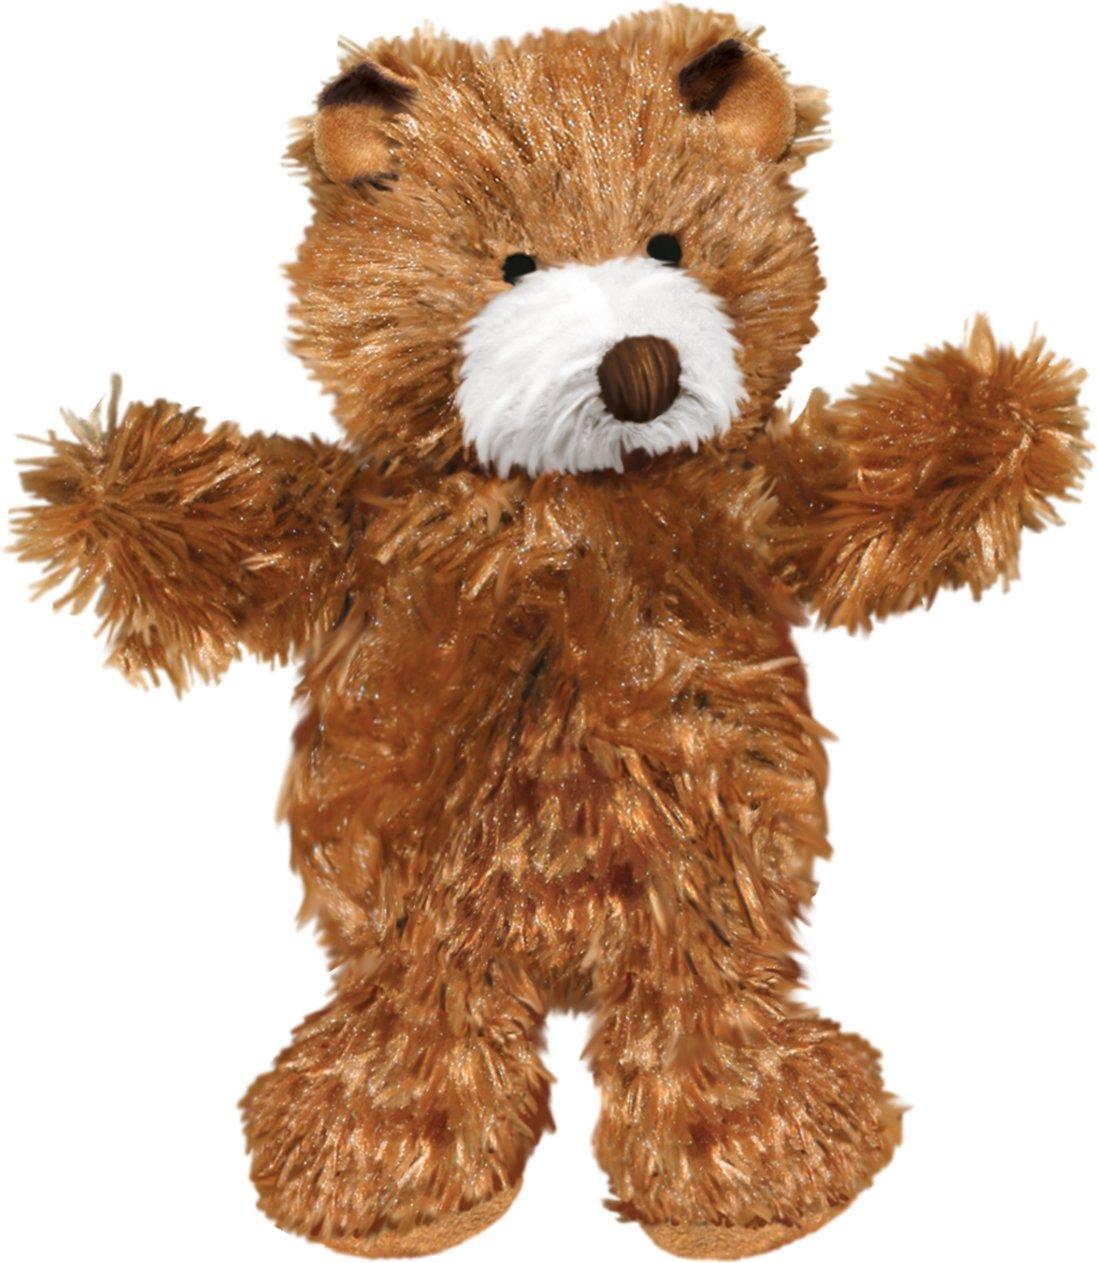 KONG Plush Teddy Bear Dog Toy Image